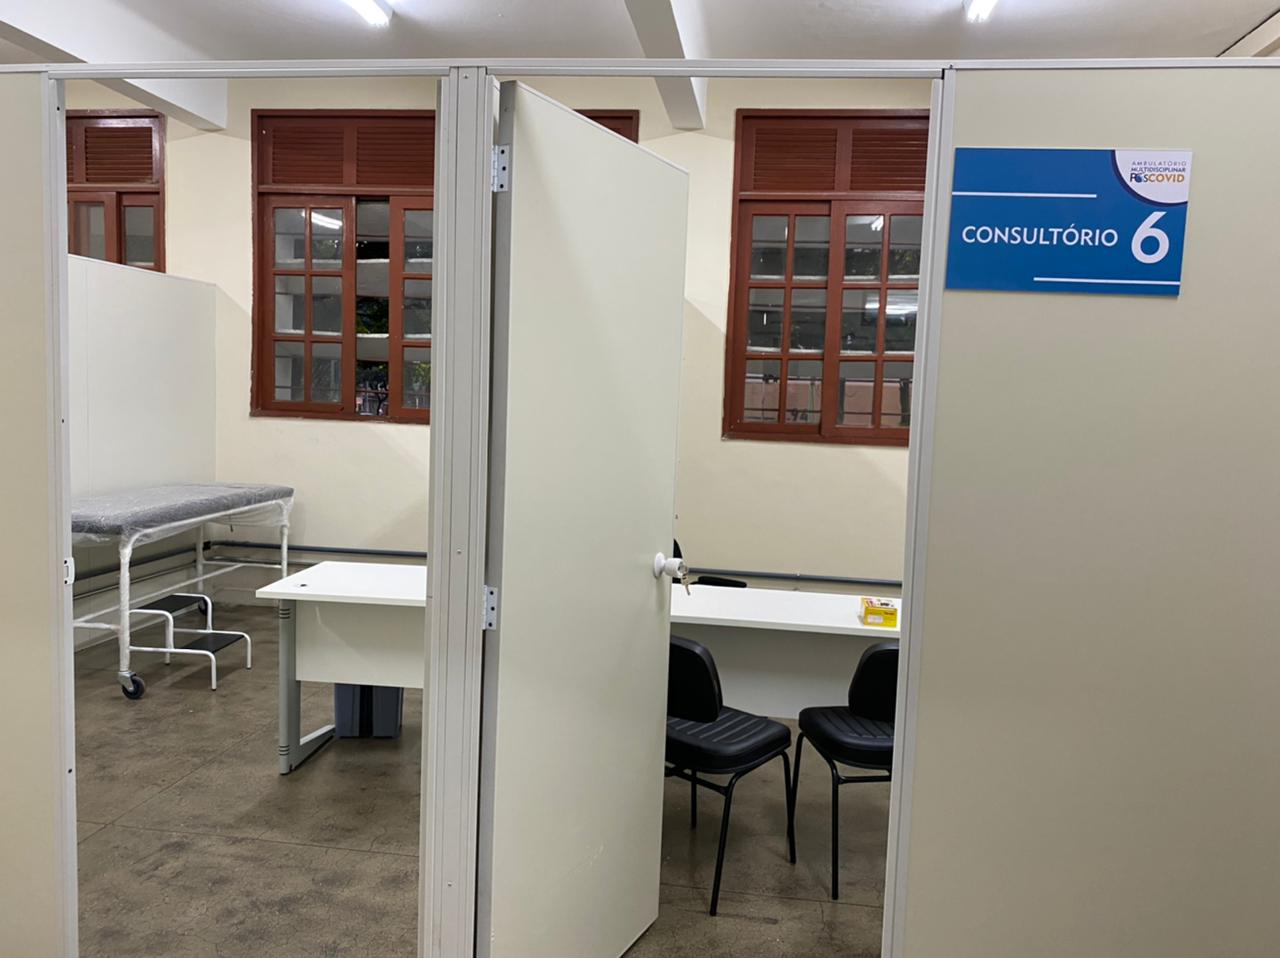 Ambulatório pós-Covid do Hospital Pedro Ernesto, da UERJ